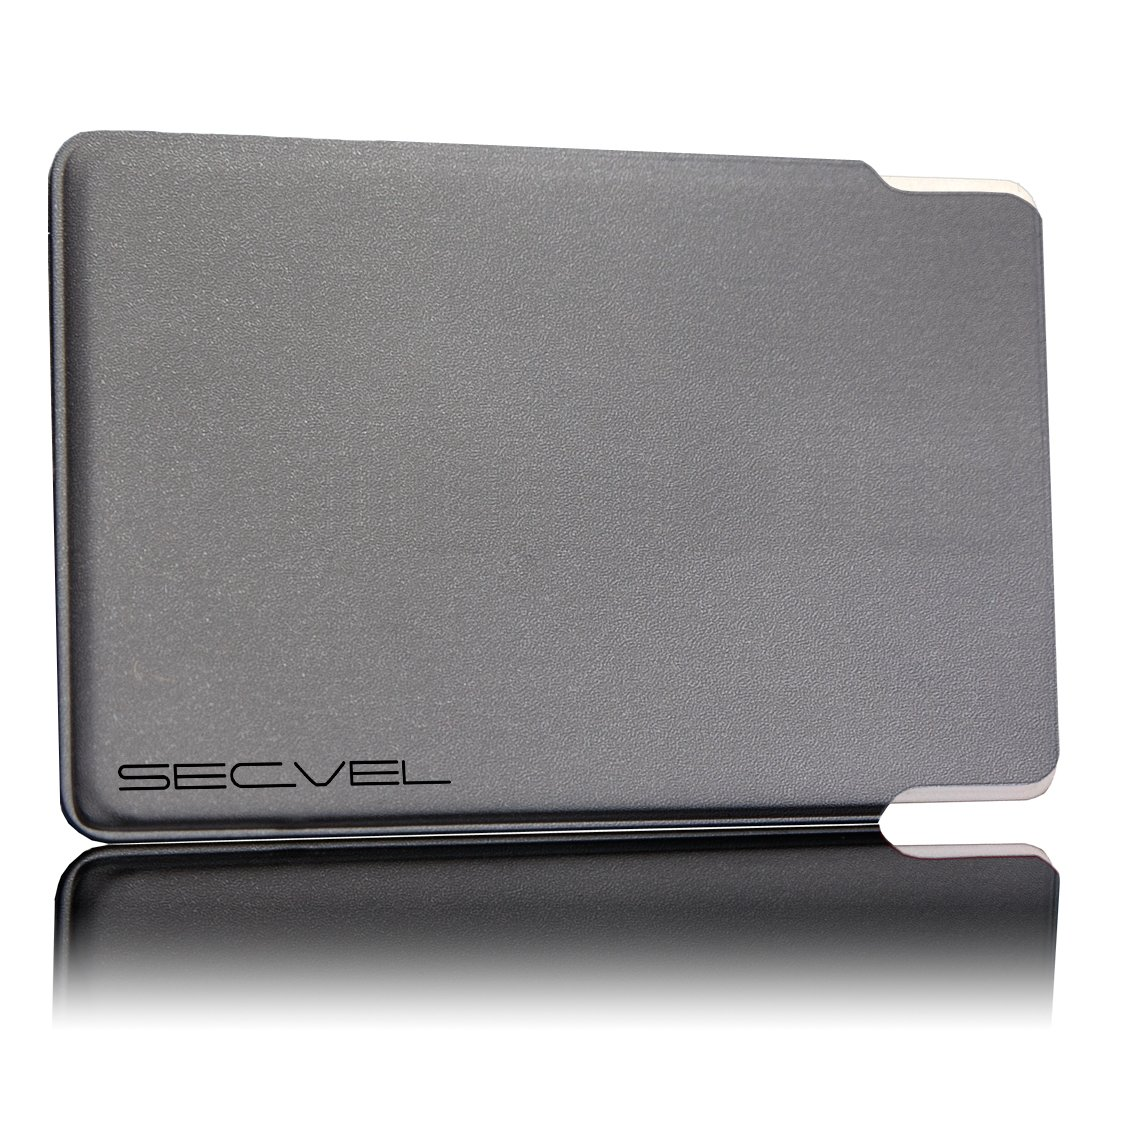 SECVEL Kartenschutzhülle Klassik - RFID/NFC & Magnetfeld Schutz - Weiß SECVEL Technologies GmbH